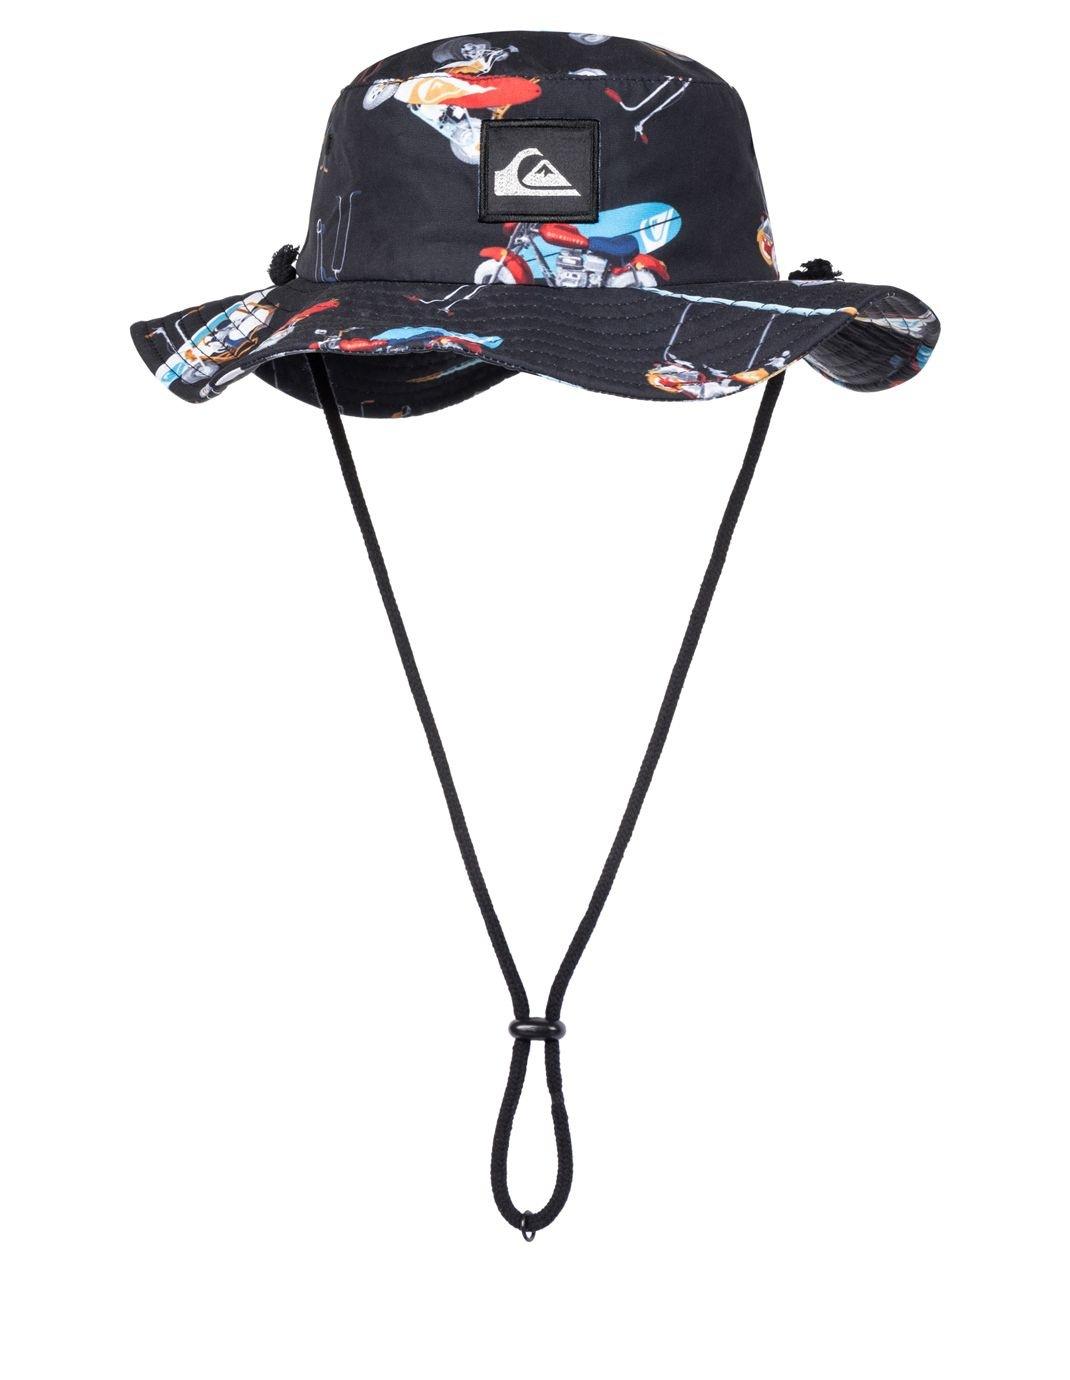 a9992539fc07b ... free shipping quiksilver sandlot bucket hat myer online 12d45 f83dd